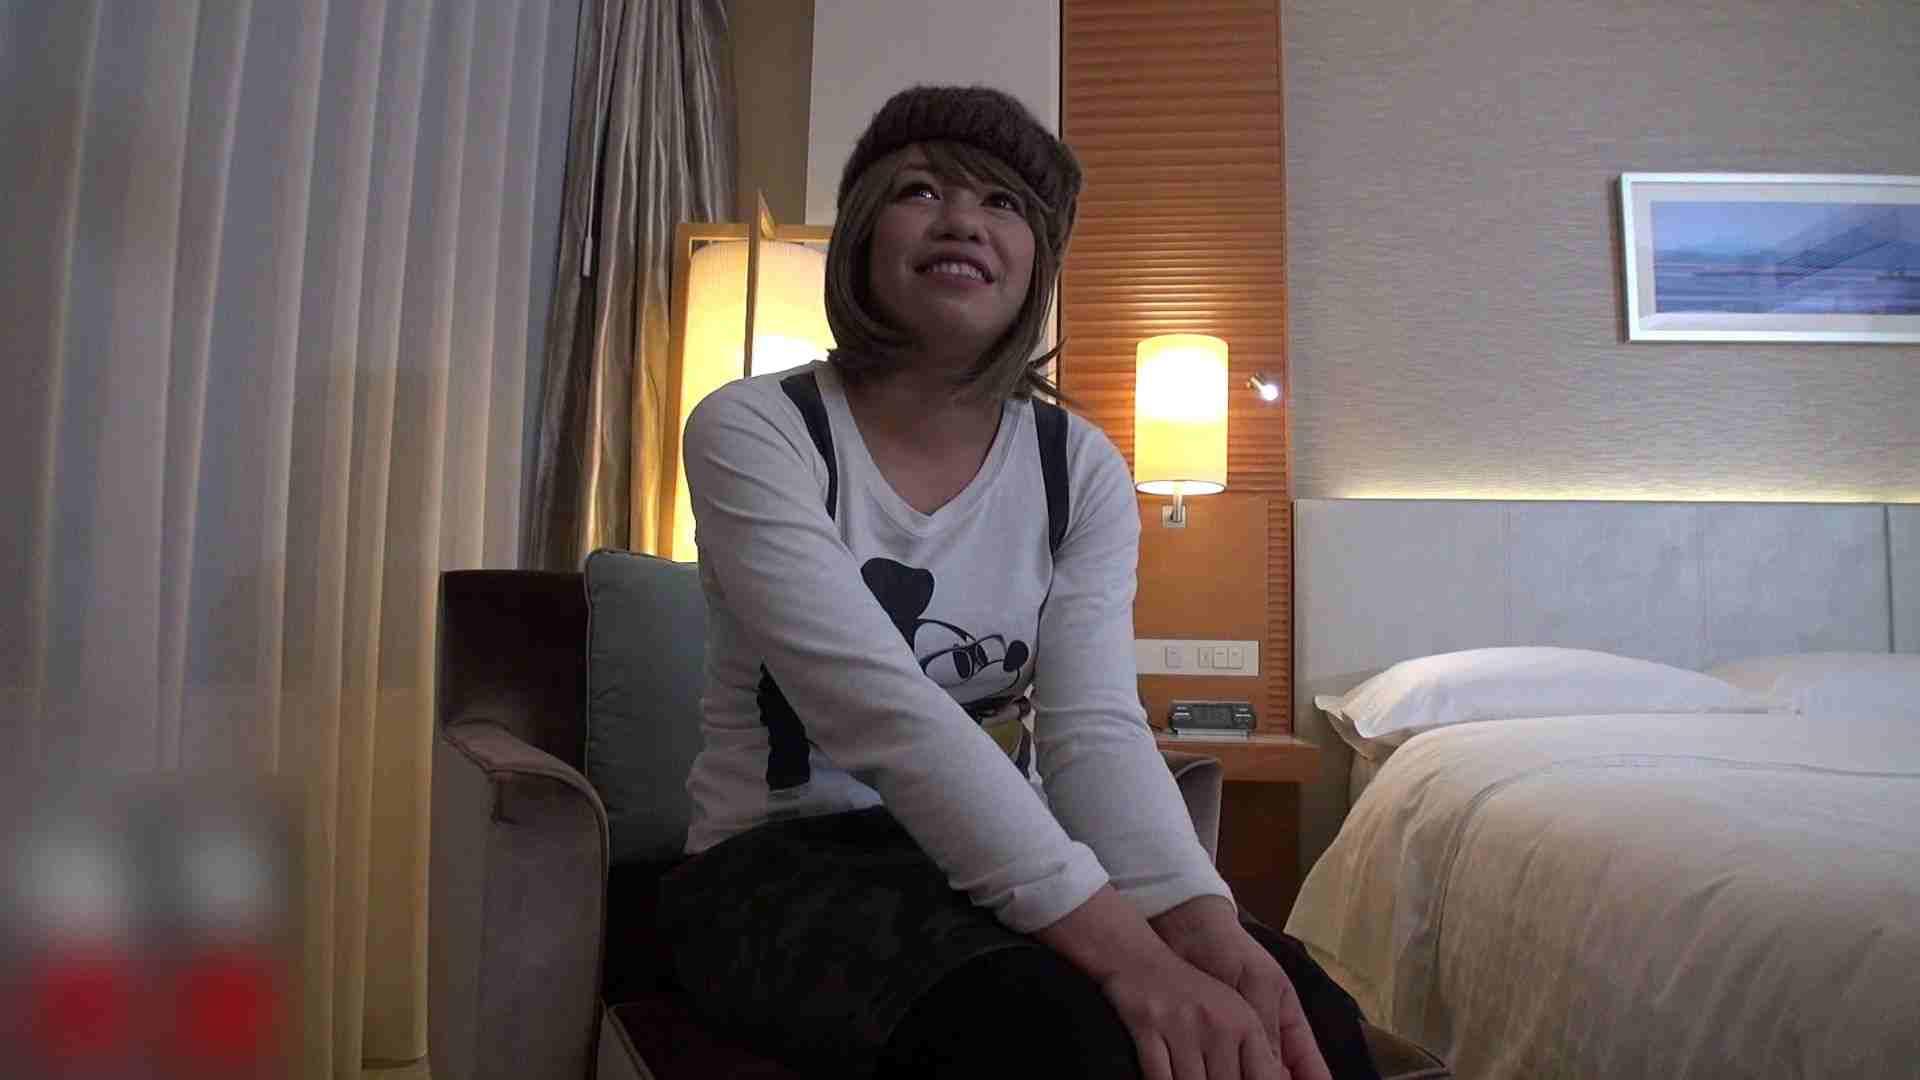 S級厳選美女ビッチガールVol.42 前編 S級美女ギャル 性交動画流出 83画像 3